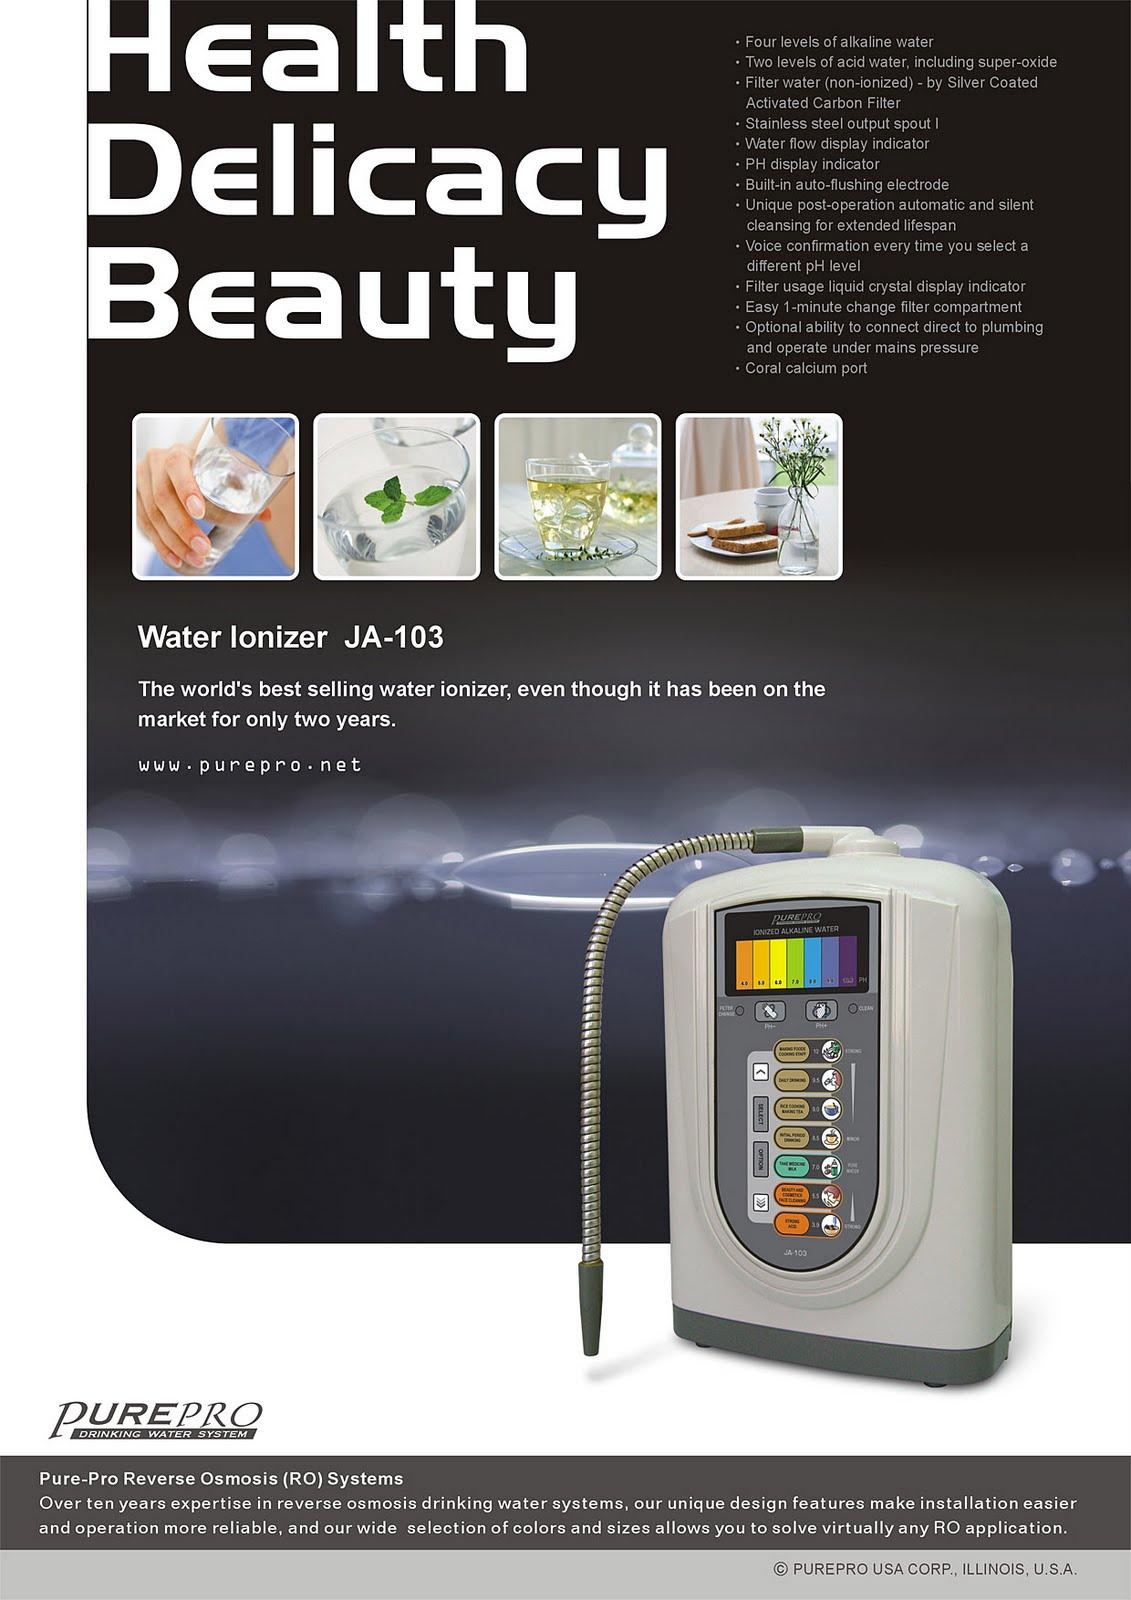 PurePro USA Water Ionizer JA-103